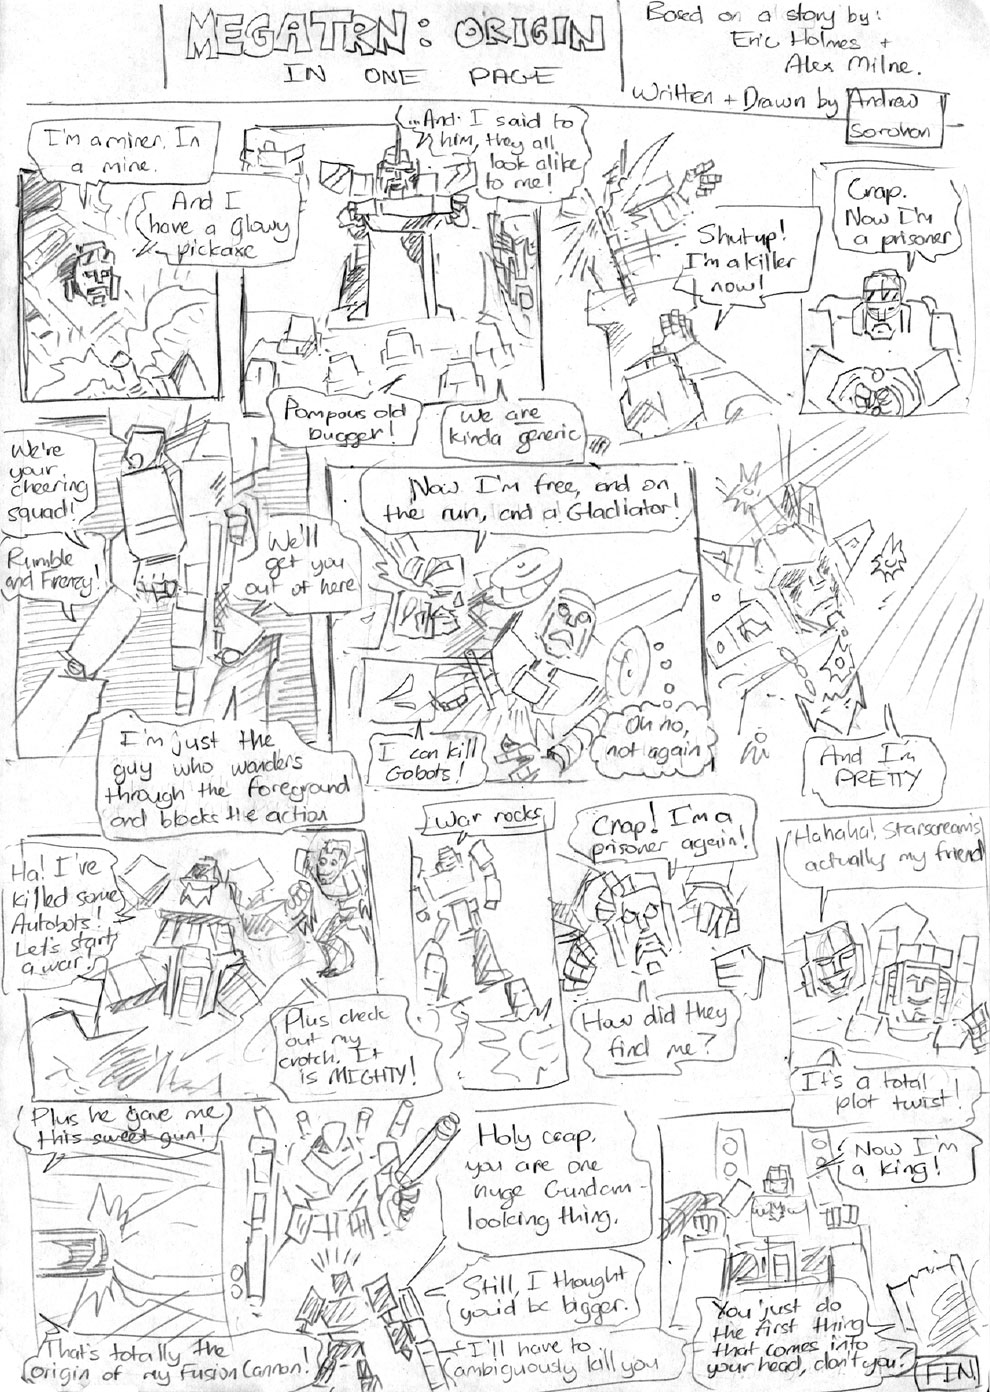 Megatron: Origin in one page